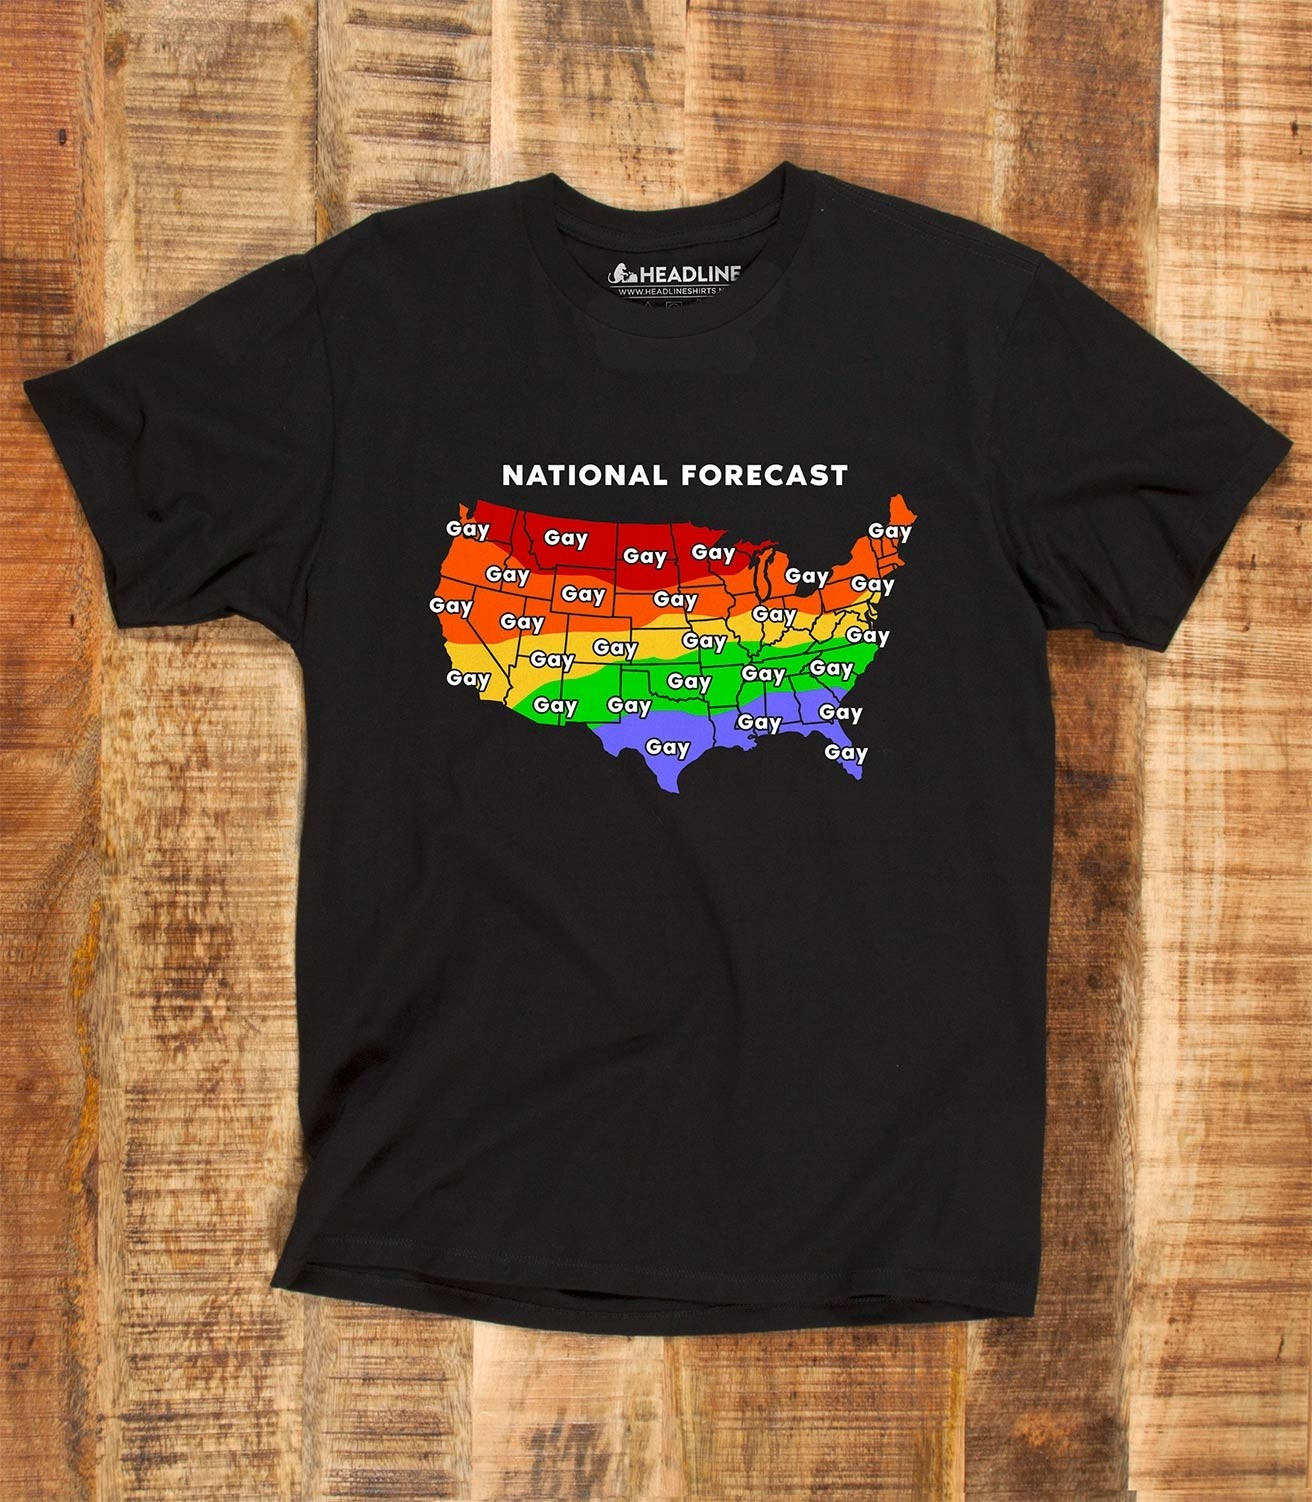 ab84c774 Gay Weather Forecast Funny Men's 100% Cotton T-Shirt | Headline Shirts